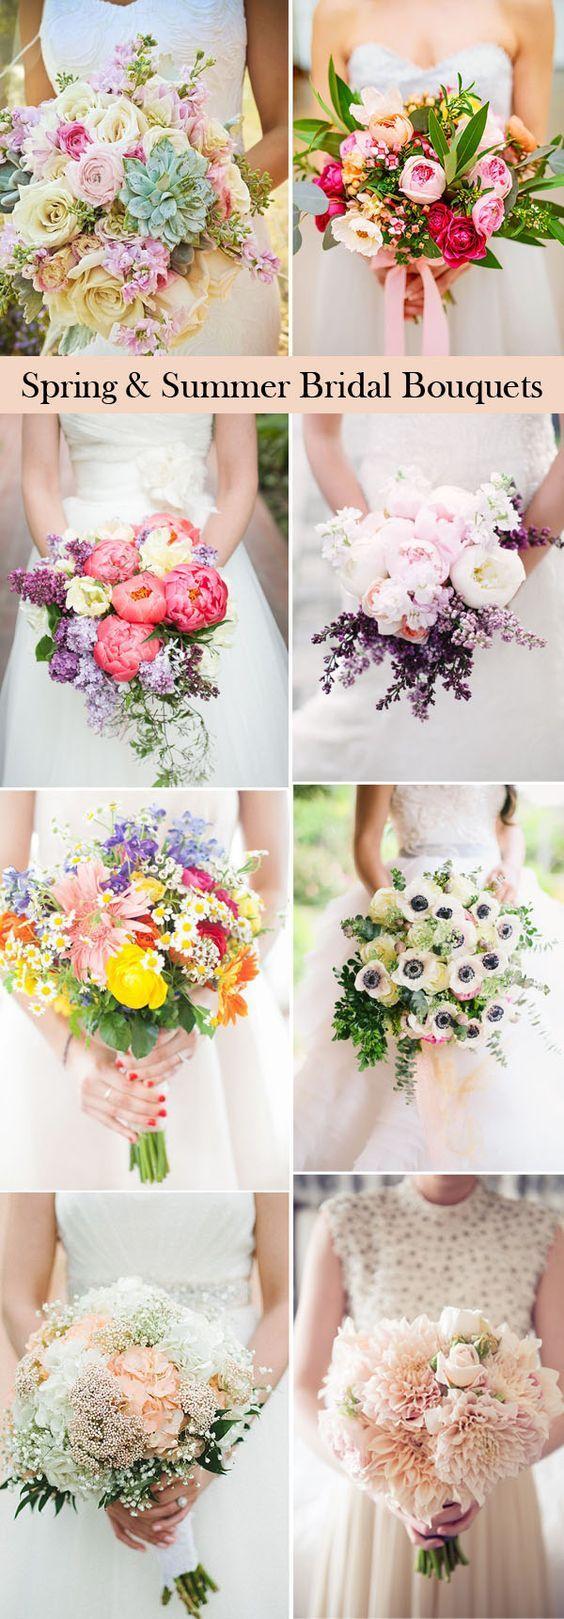 674 best Wedding images on Pinterest | Engagements, Wedding ideas ...